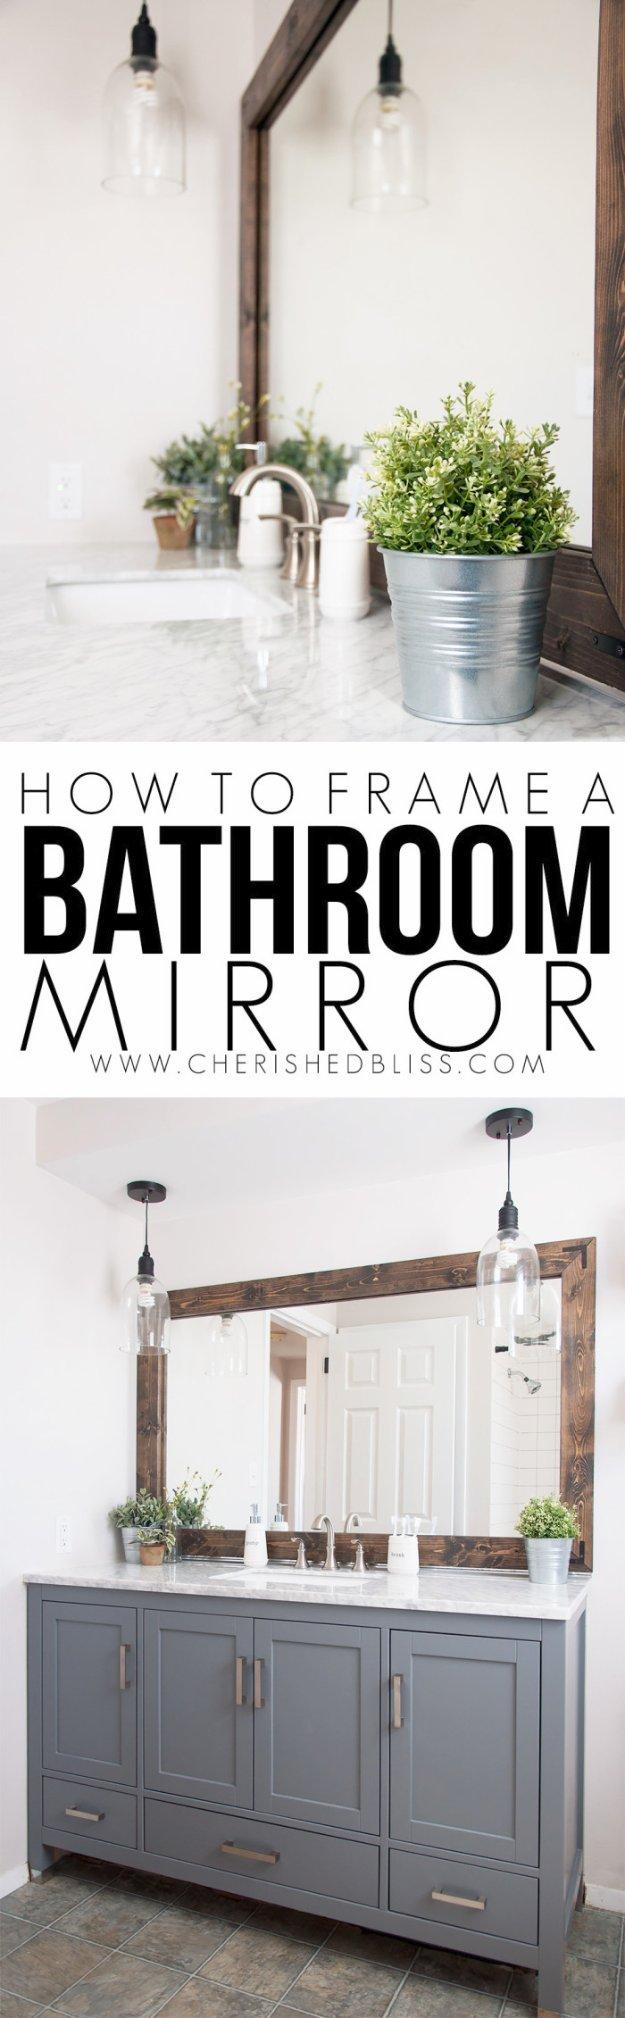 DIY Bathroom Decor Ideas - Wood Framed Bathroom Mirror Tutorial - Cool Do It Yourself Bath Ideas on A Budget, Rustic Bathroom Fixtures, Creative Wall Art, Rugs mason jar idea bath diy